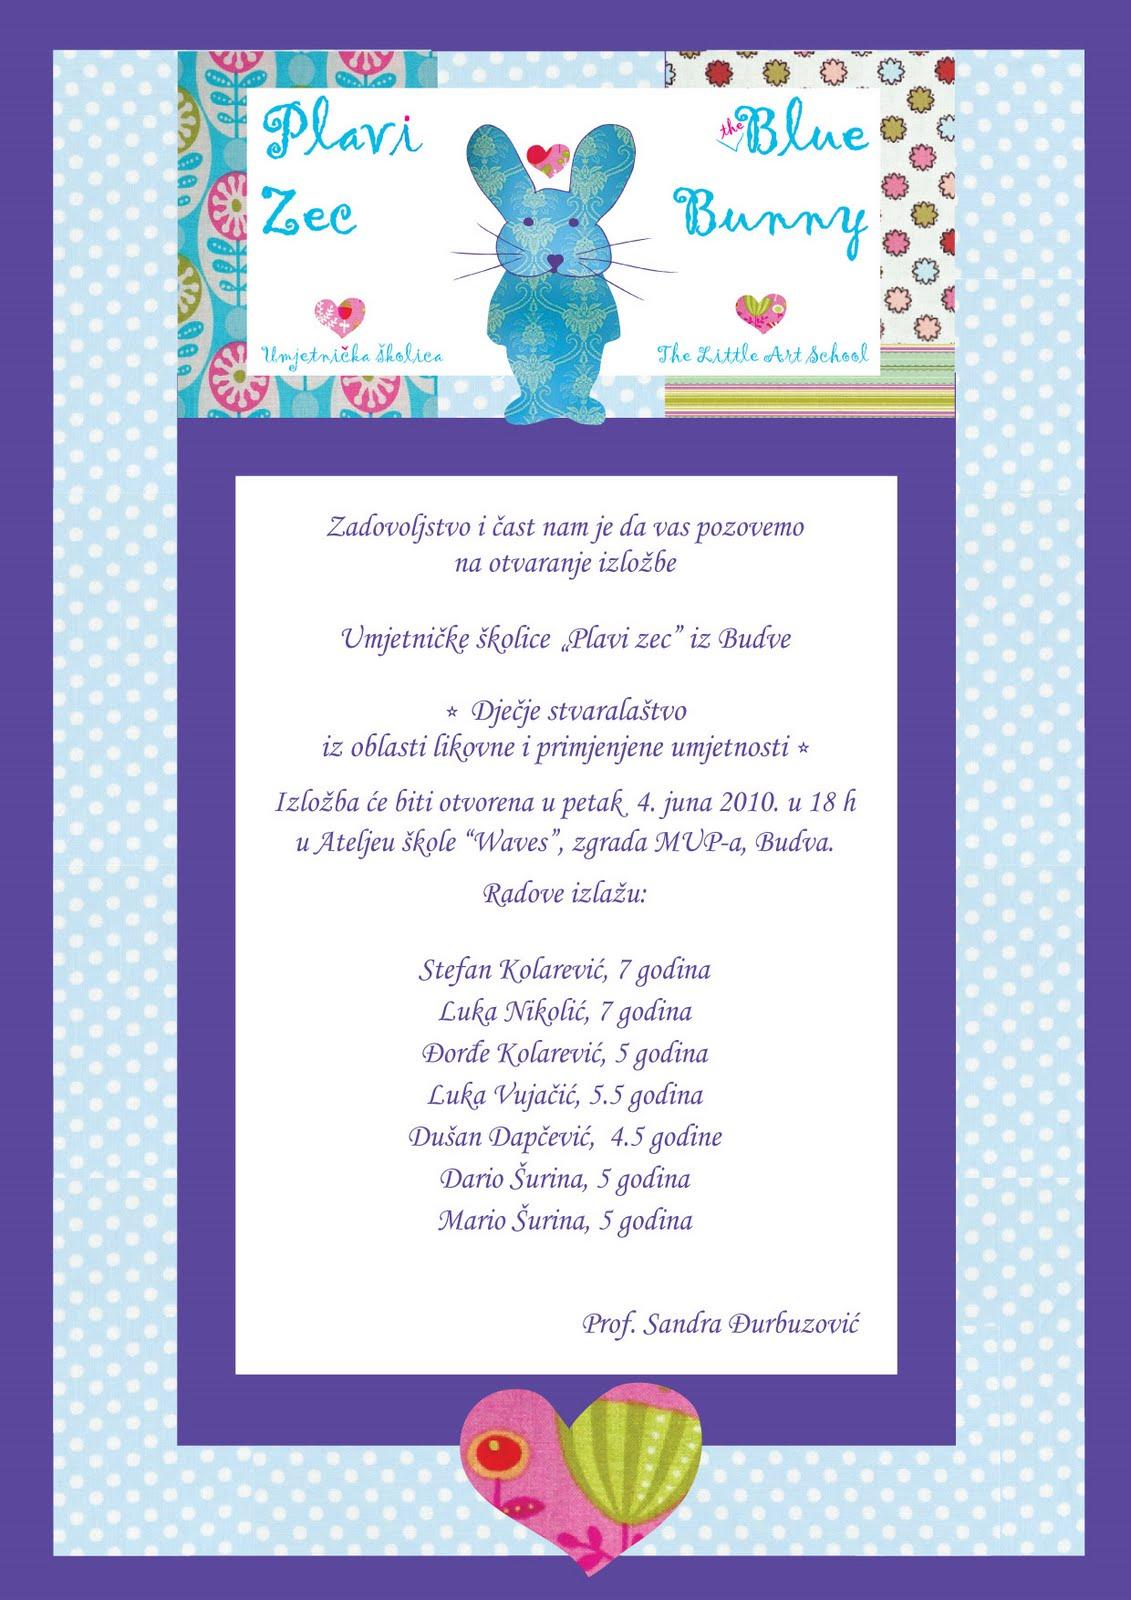 čestitke za krštenje bebe najlepse cestitke za rodjenje bebe   diabergiostat36's soup čestitke za krštenje bebe